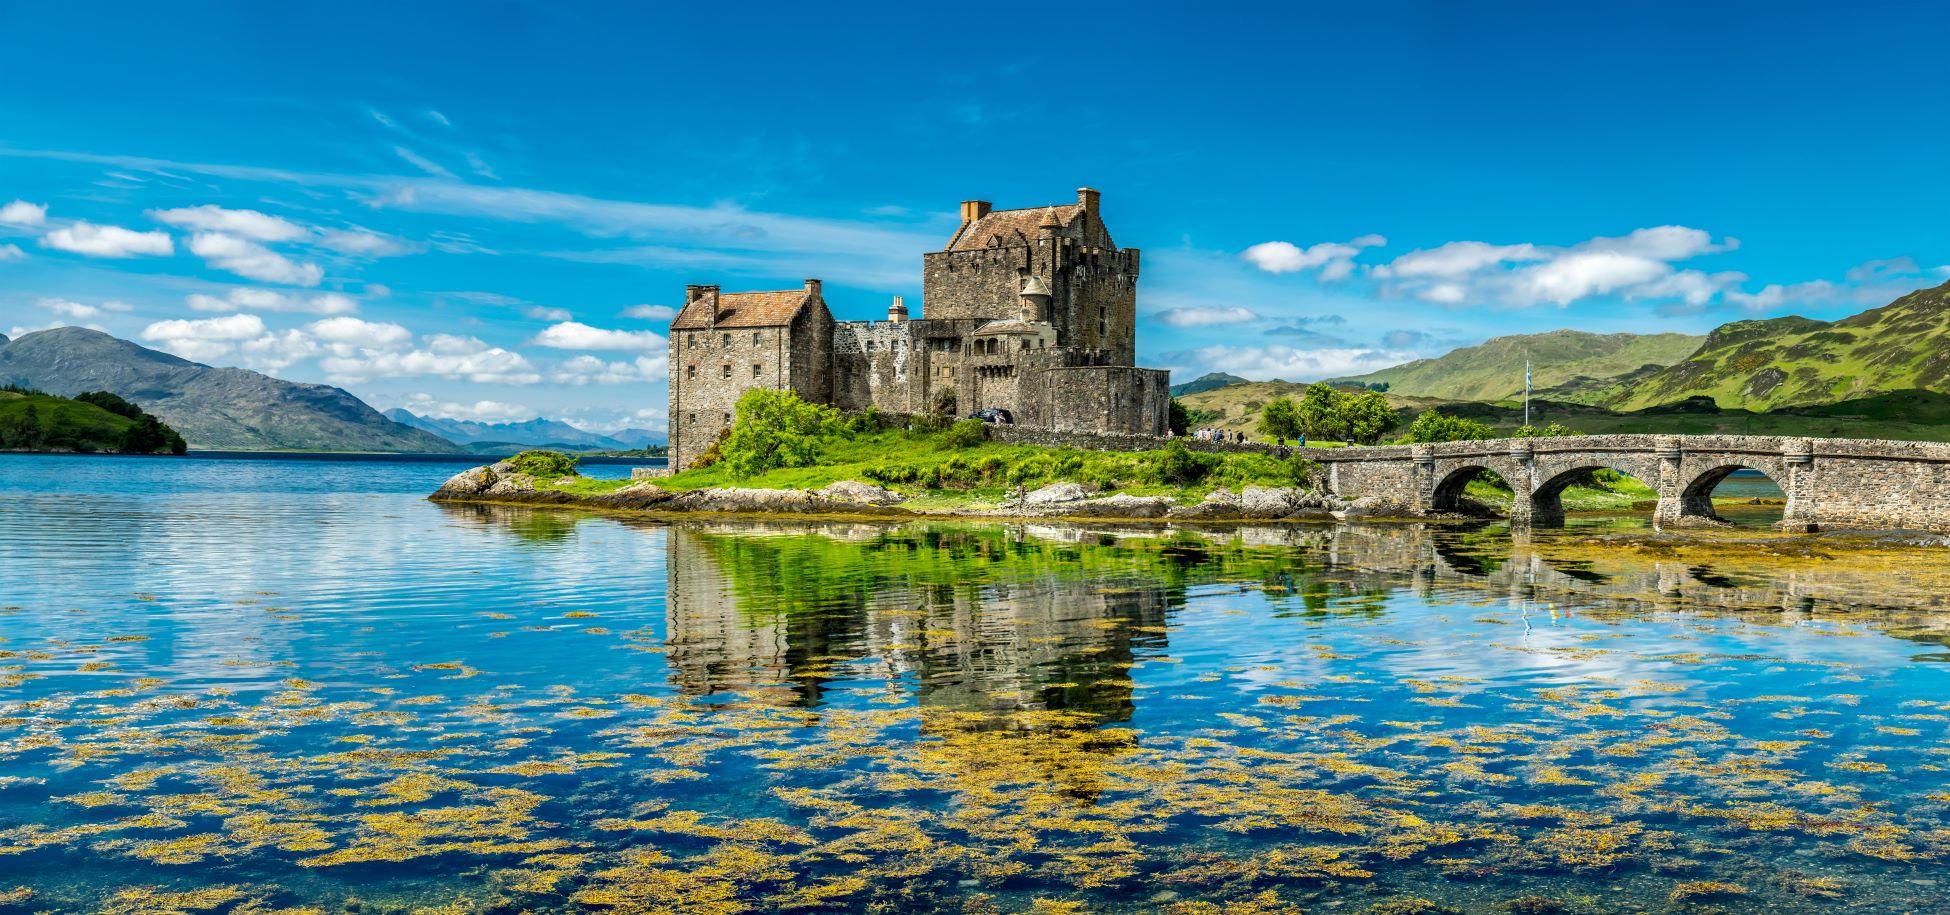 Eilean Donan Castle, Scotland - one of Britain's best island churches